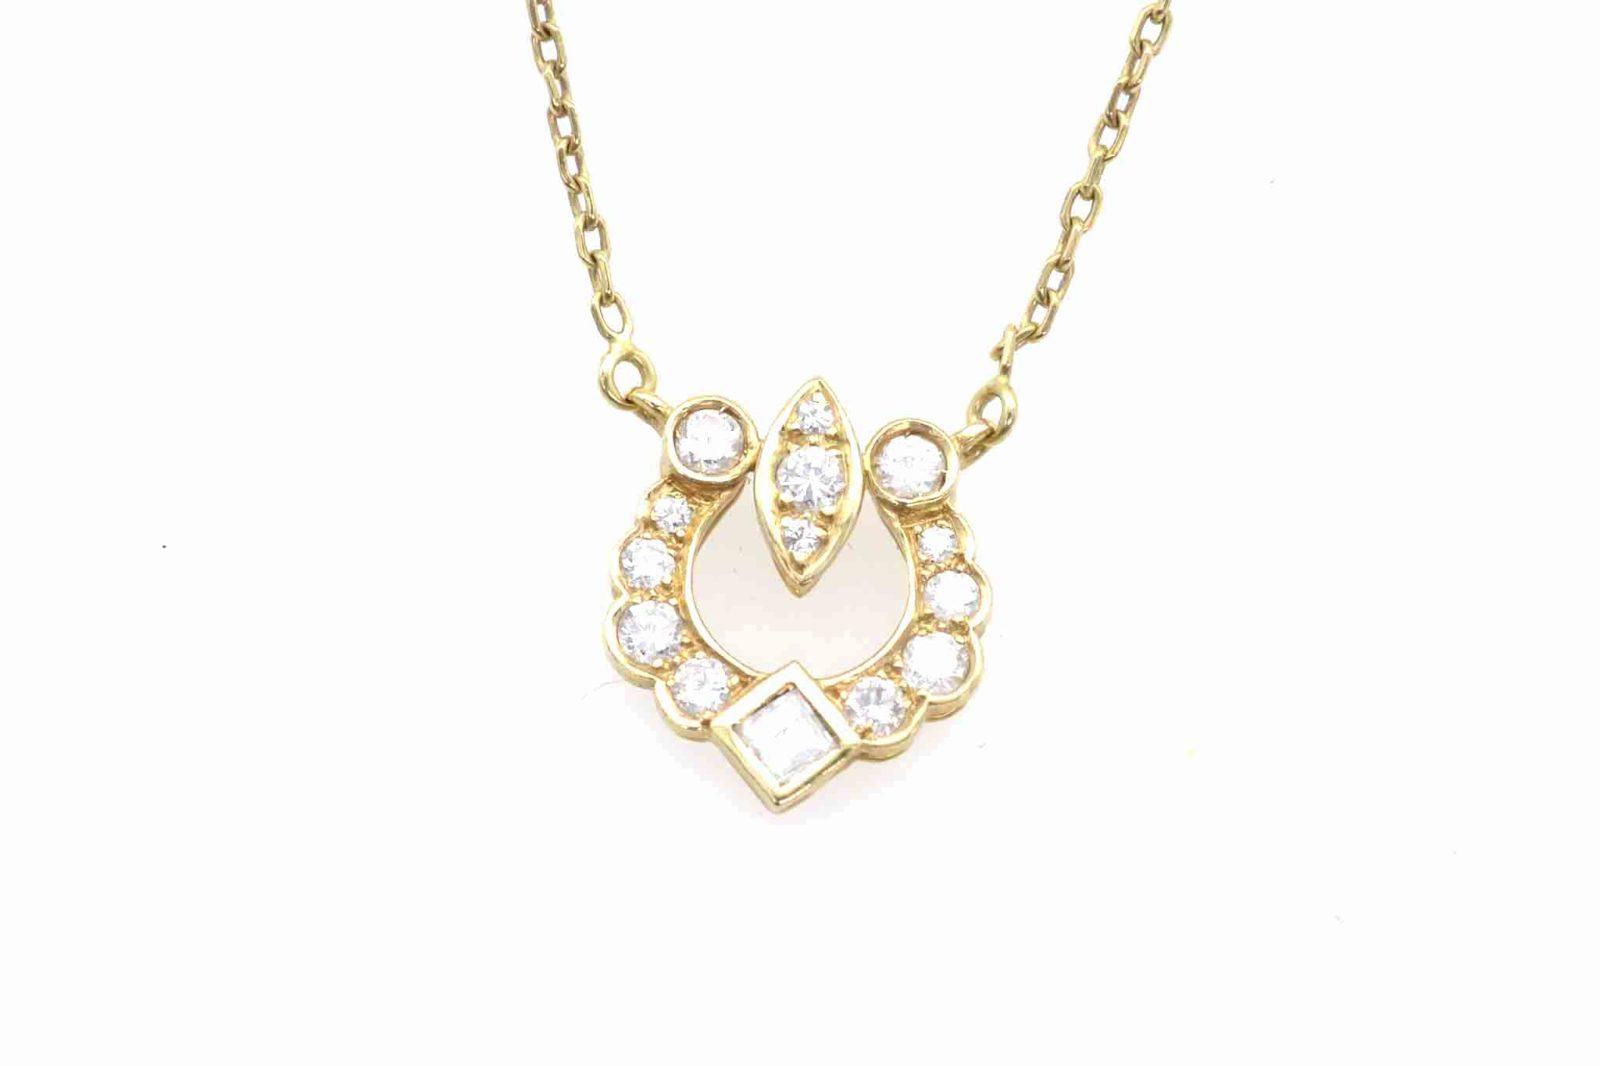 Collier Cartier diamants